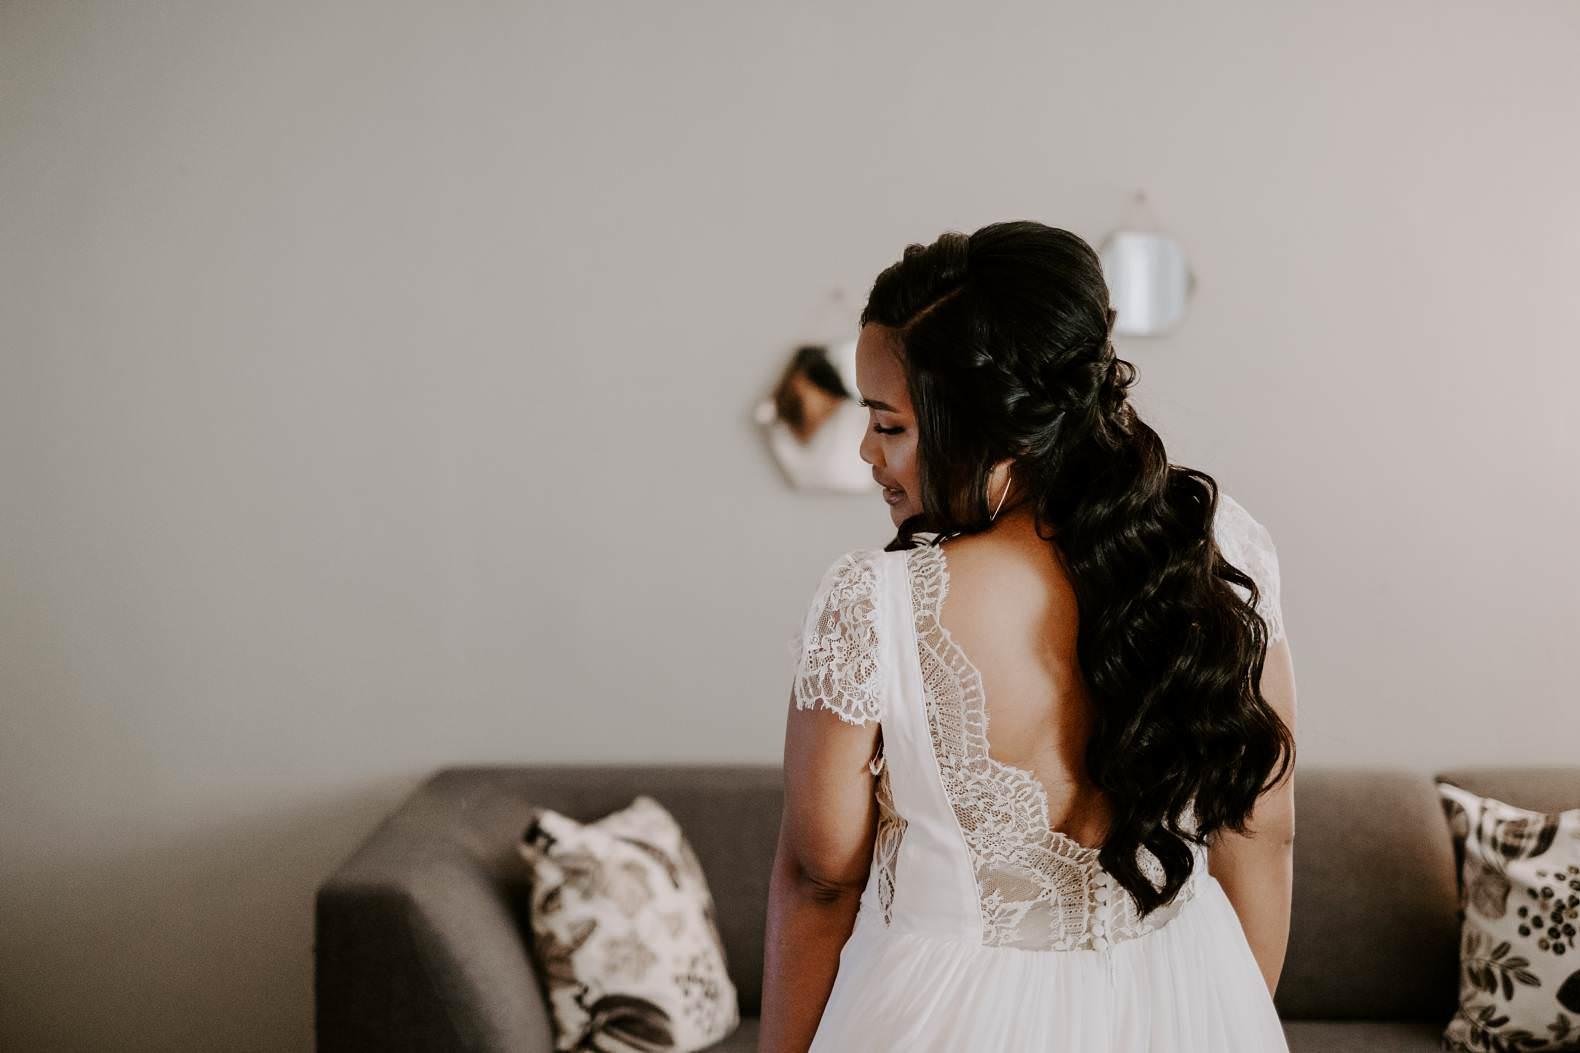 mariage manoir de corny photographe bel esprit 0004 1